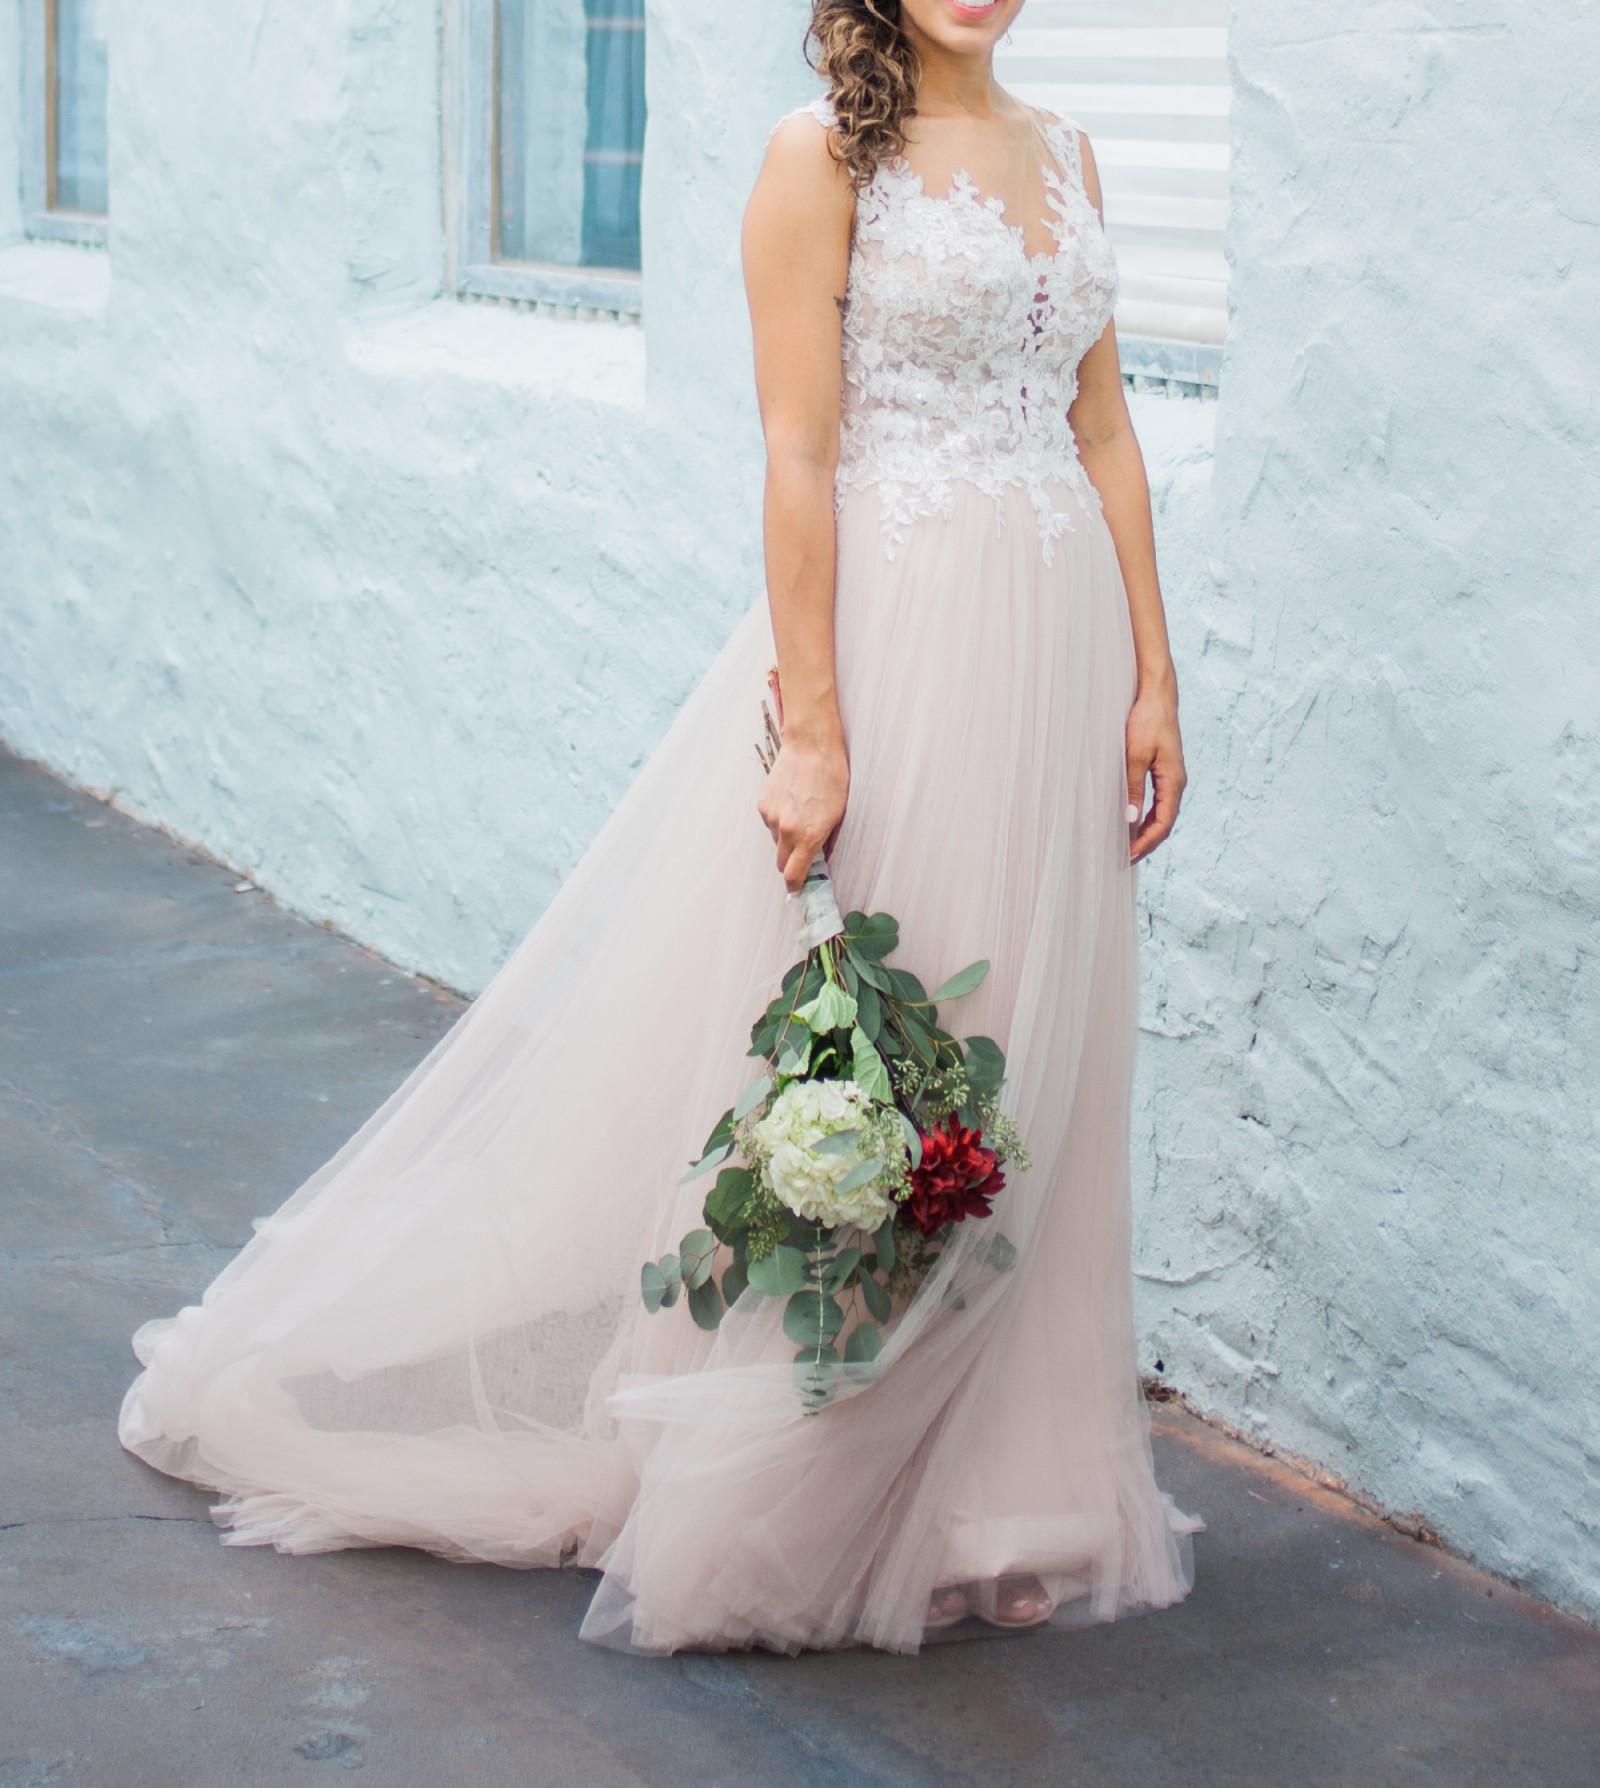 Stella York 6490 Used Wedding Dress On Sale 42% Off